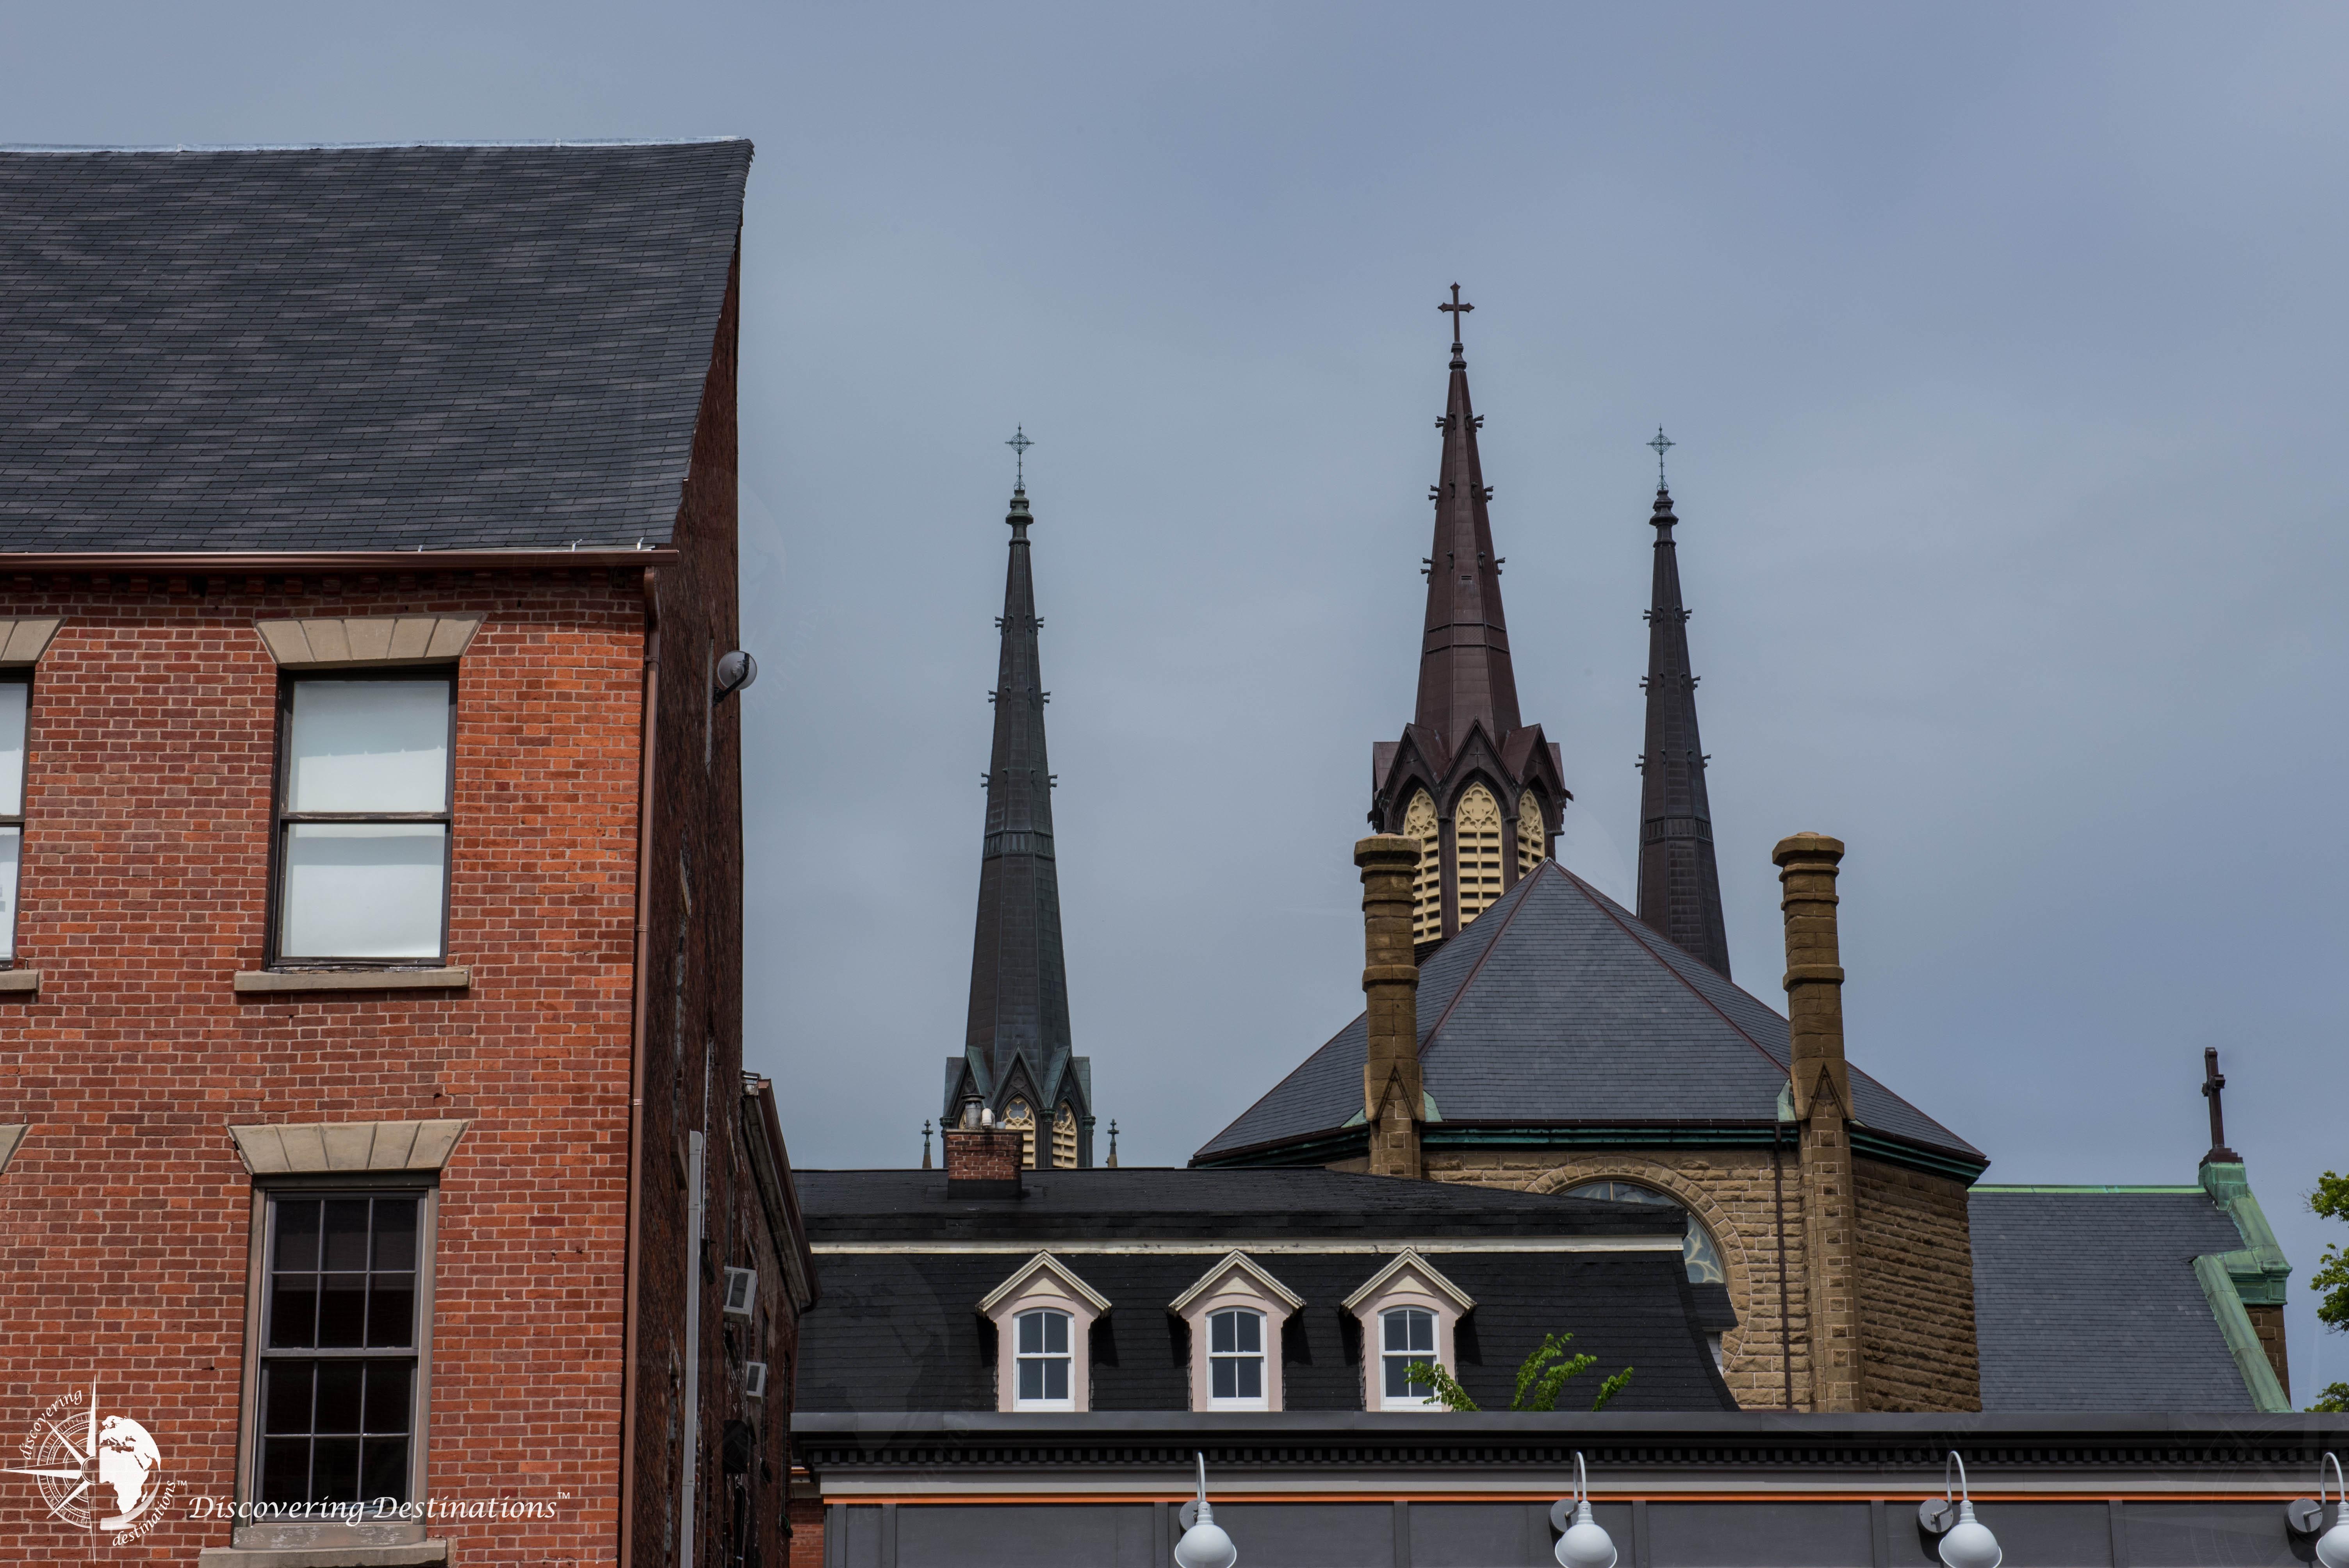 Charlottetown skyline